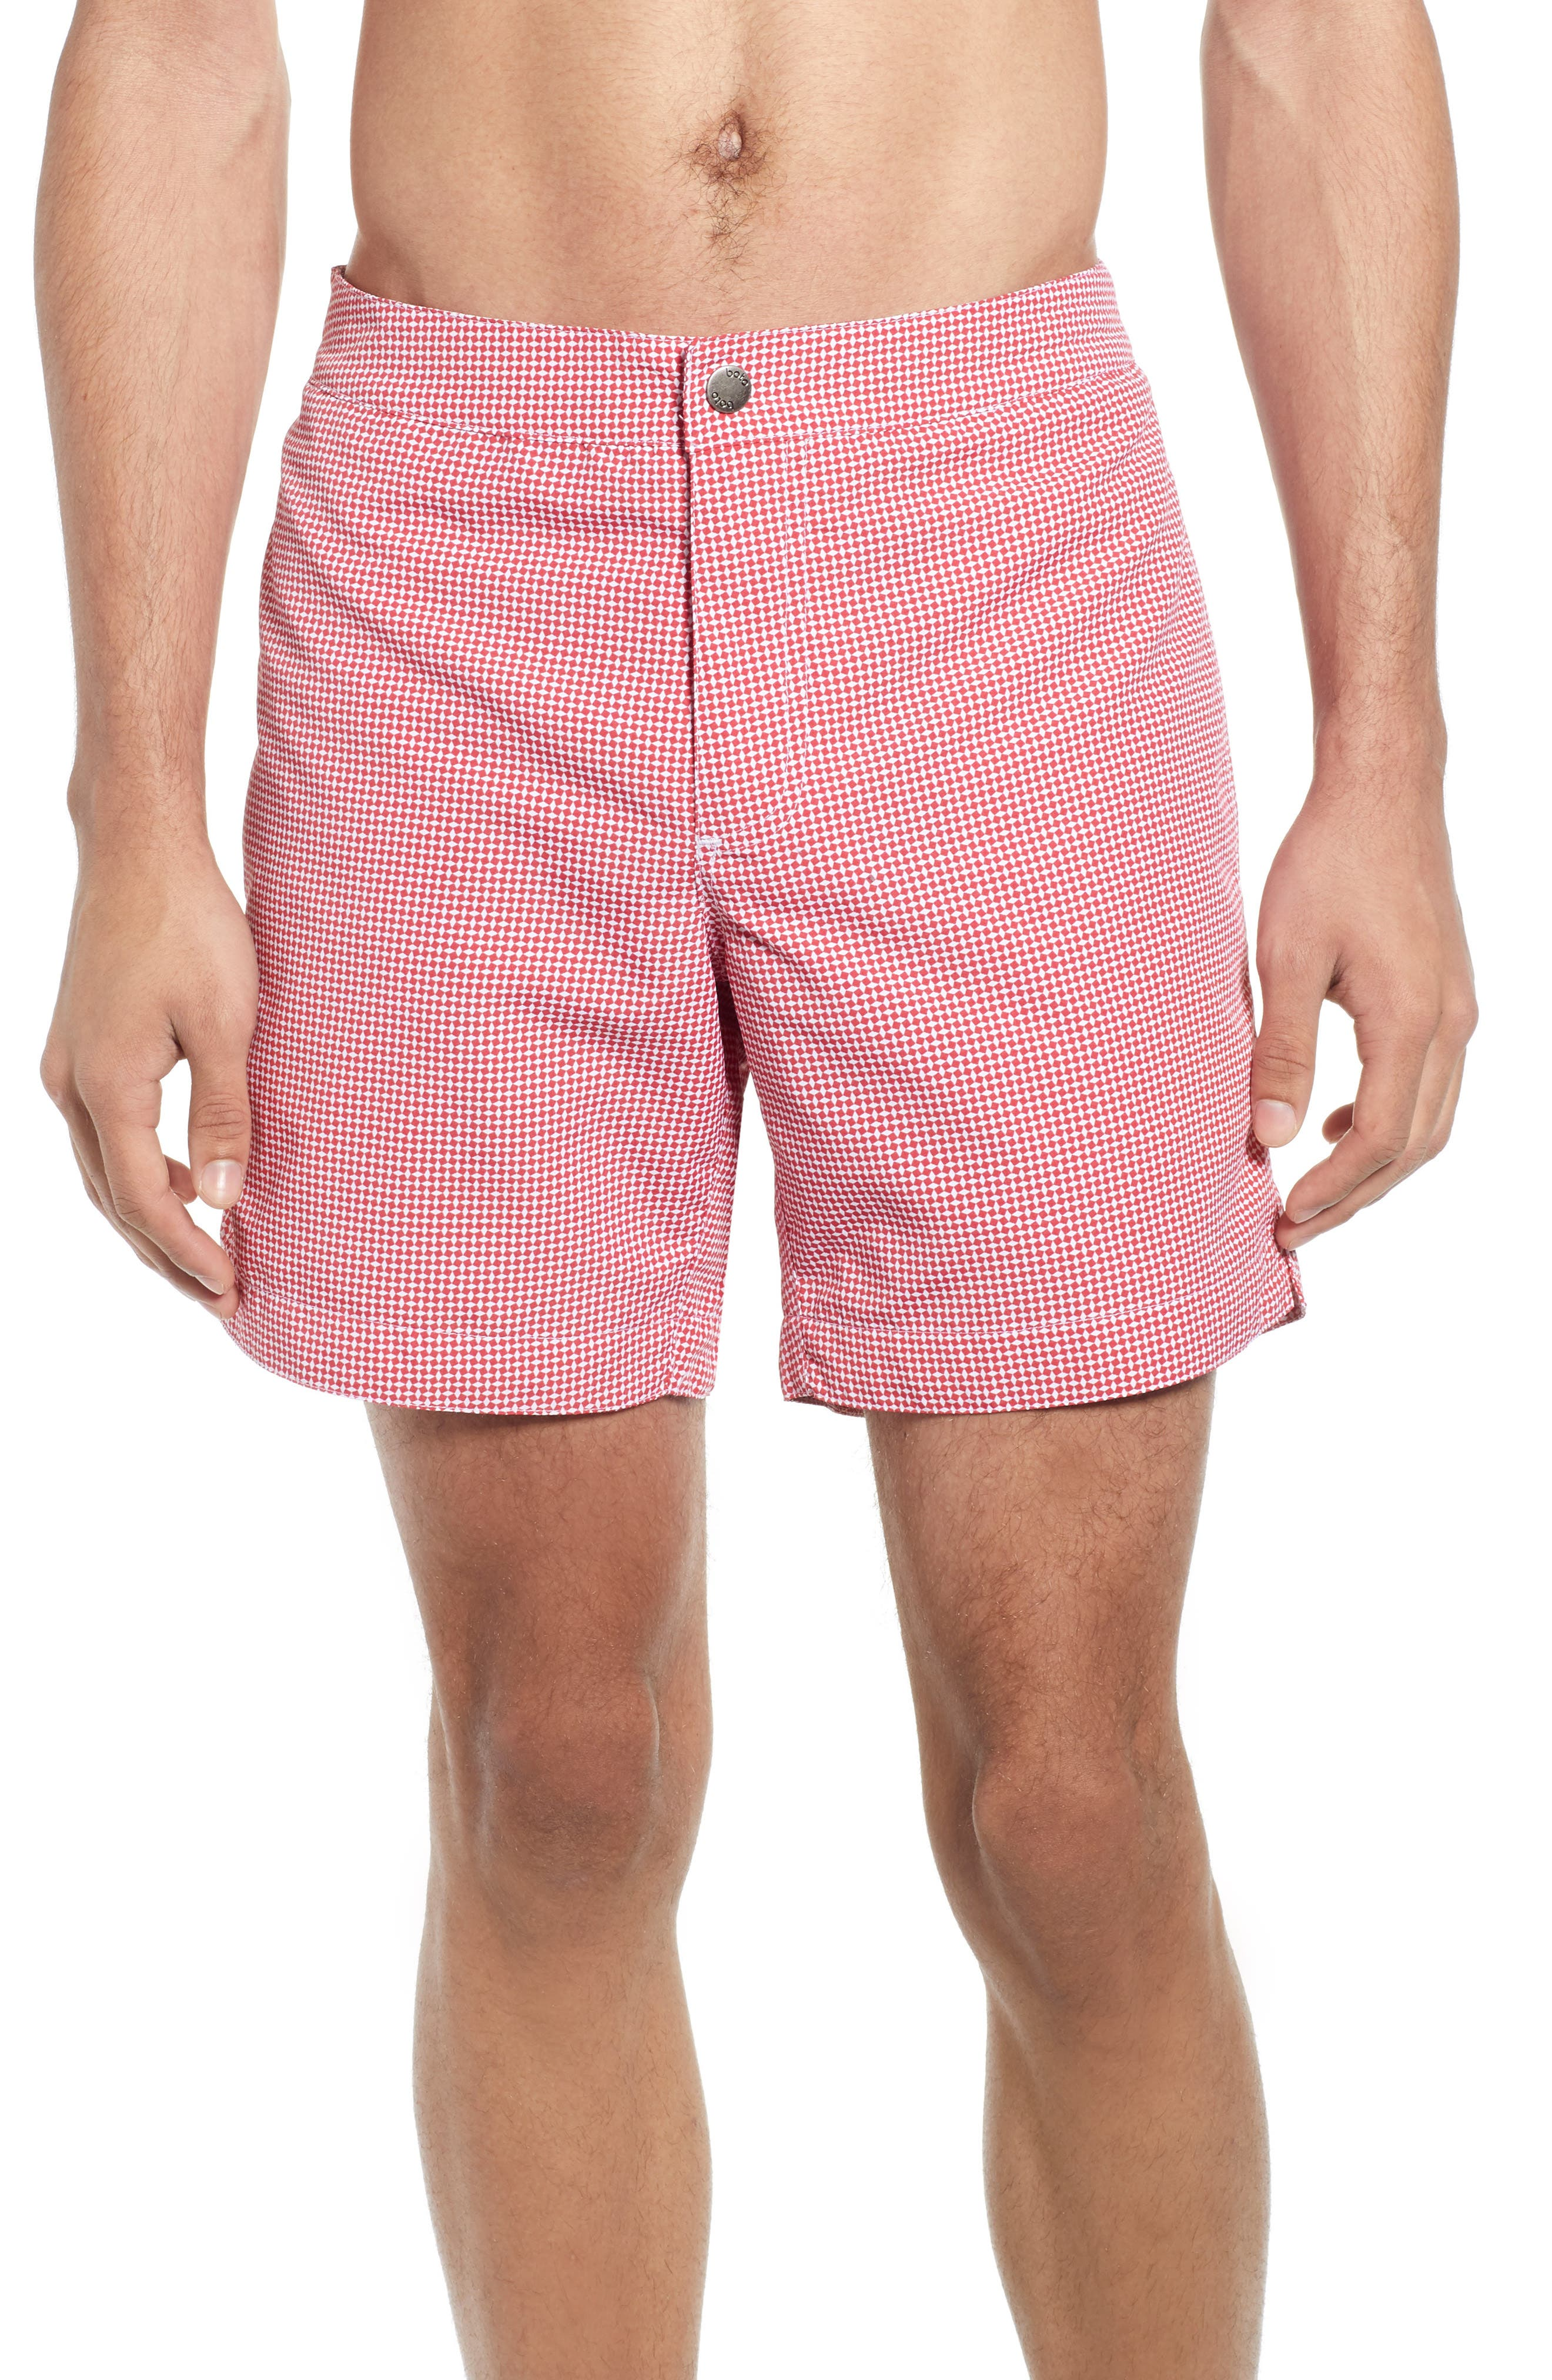 Vintage Men's Swimsuits – 1930s to 1970s History Mens Boto Aruba Slim Fit Diamond Swim Trunks Size 36 - Coral $79.00 AT vintagedancer.com